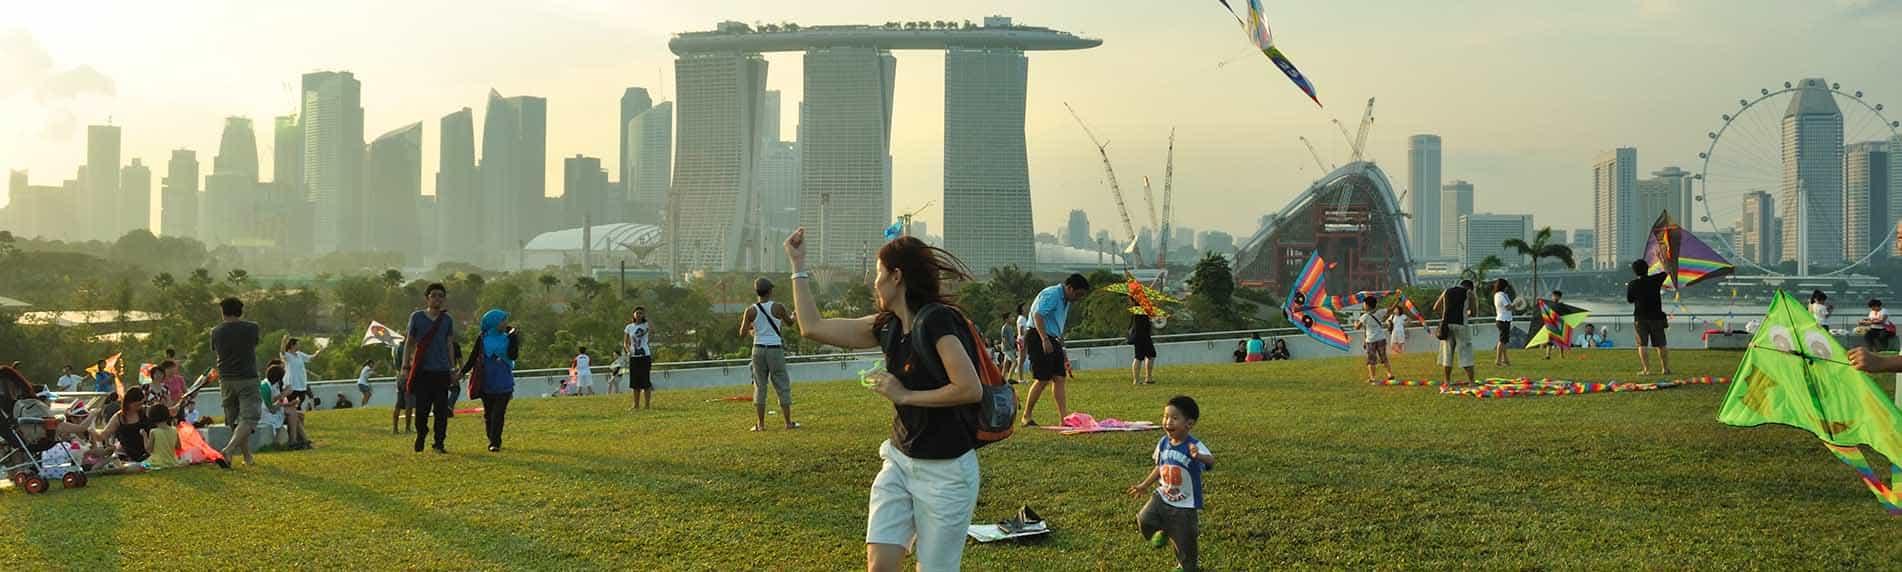 Fun Vacations Singapore 7 Nights